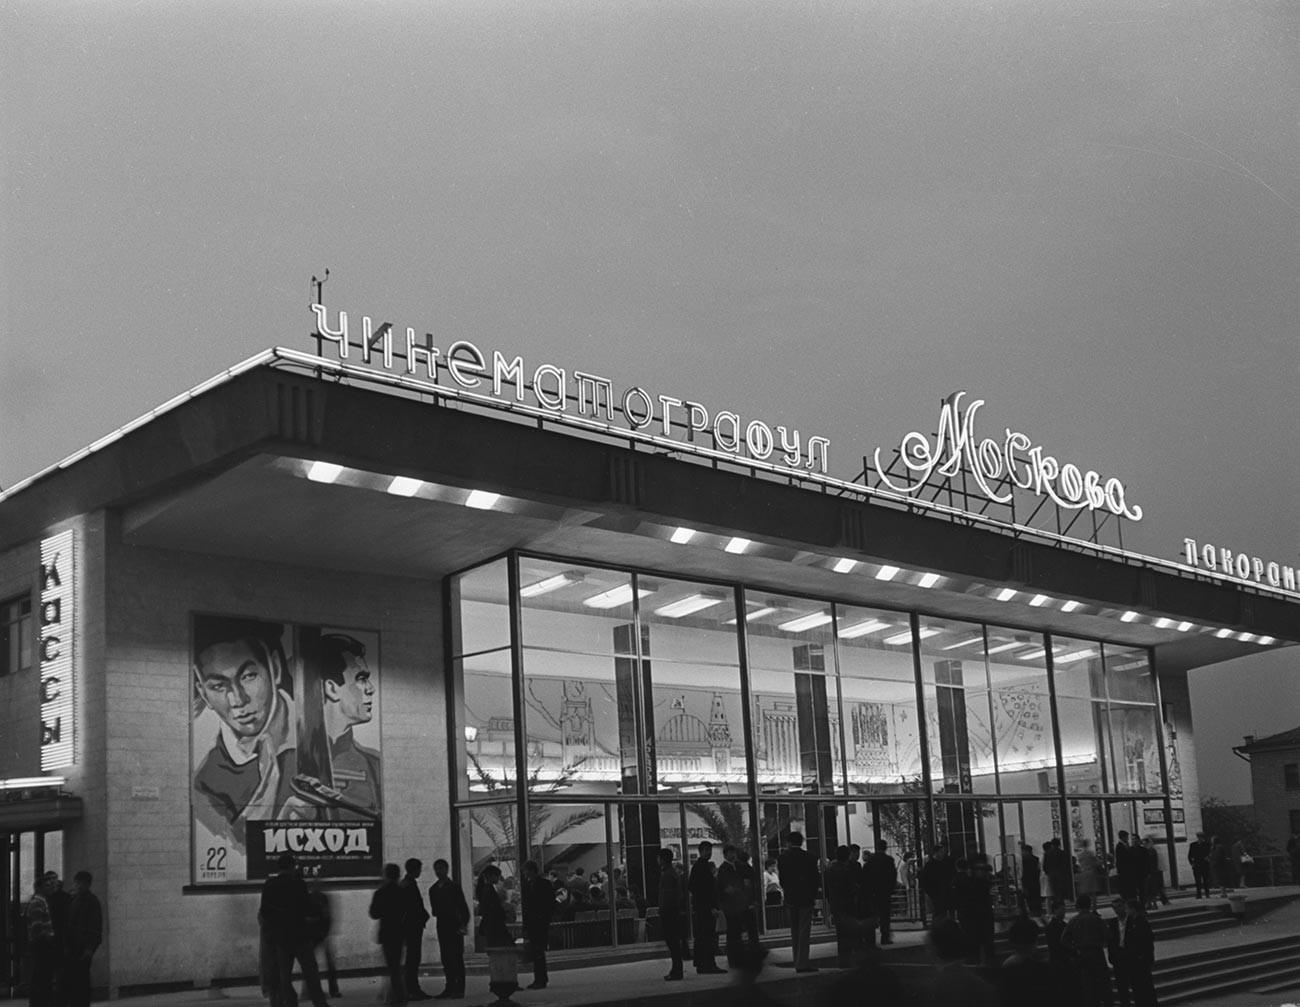 Moskowa Kino in Chișinău, 1968